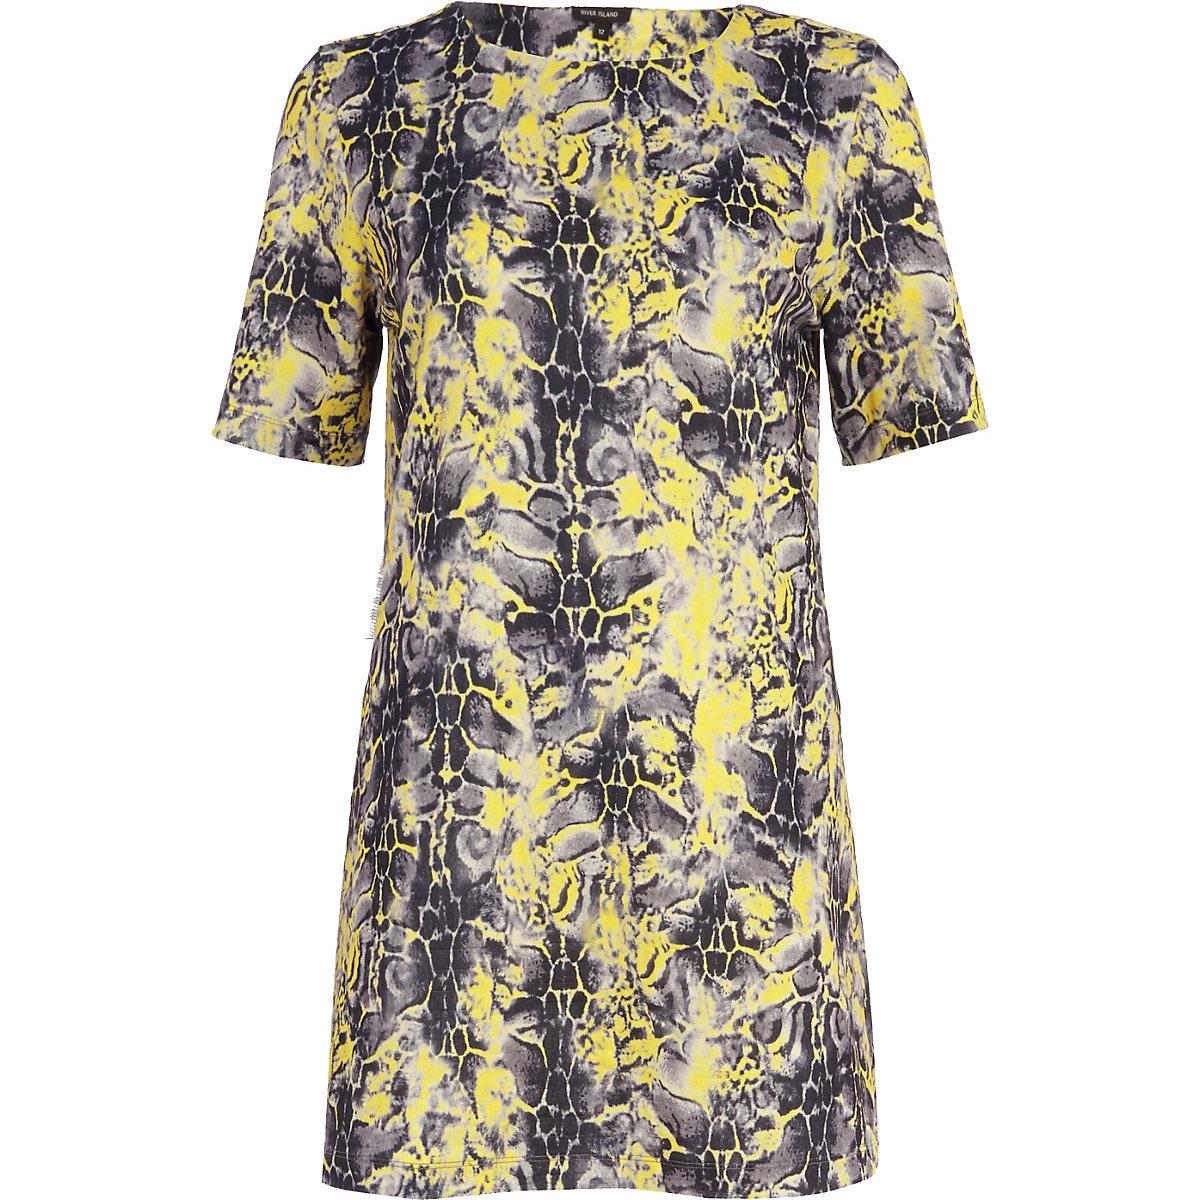 Yellow animal print shift dress